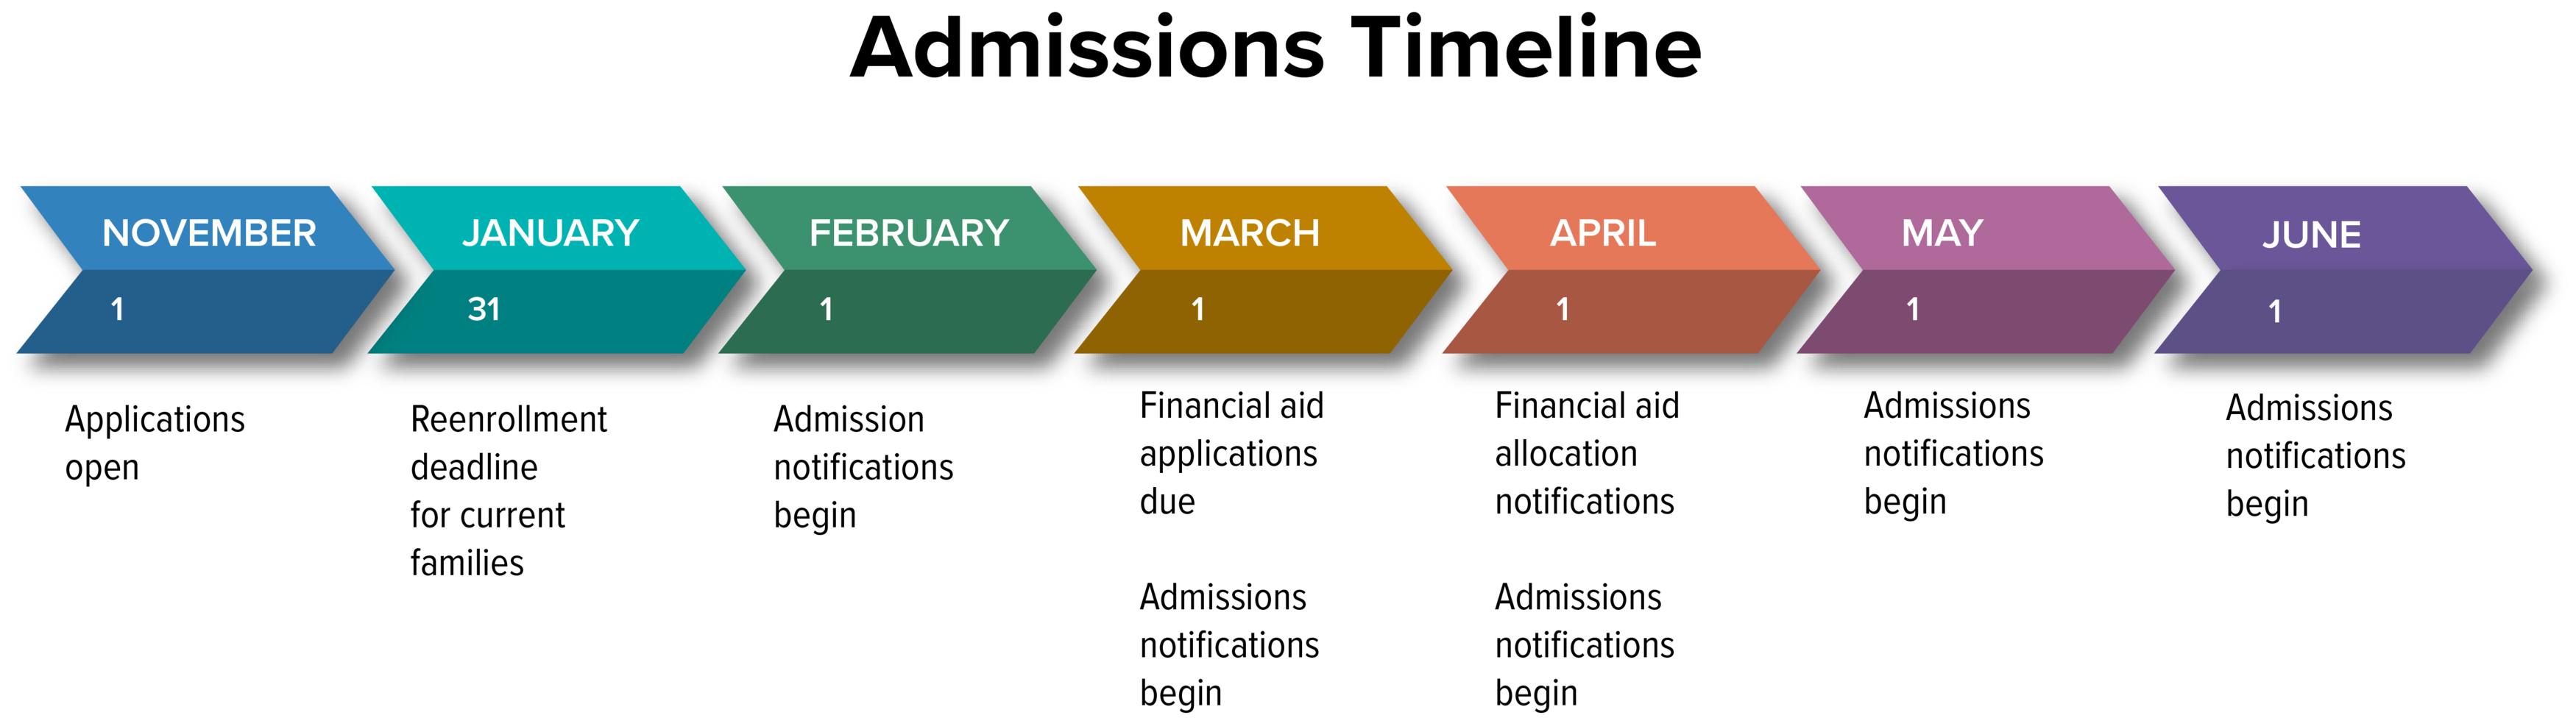 MRCA Admissions Timeline